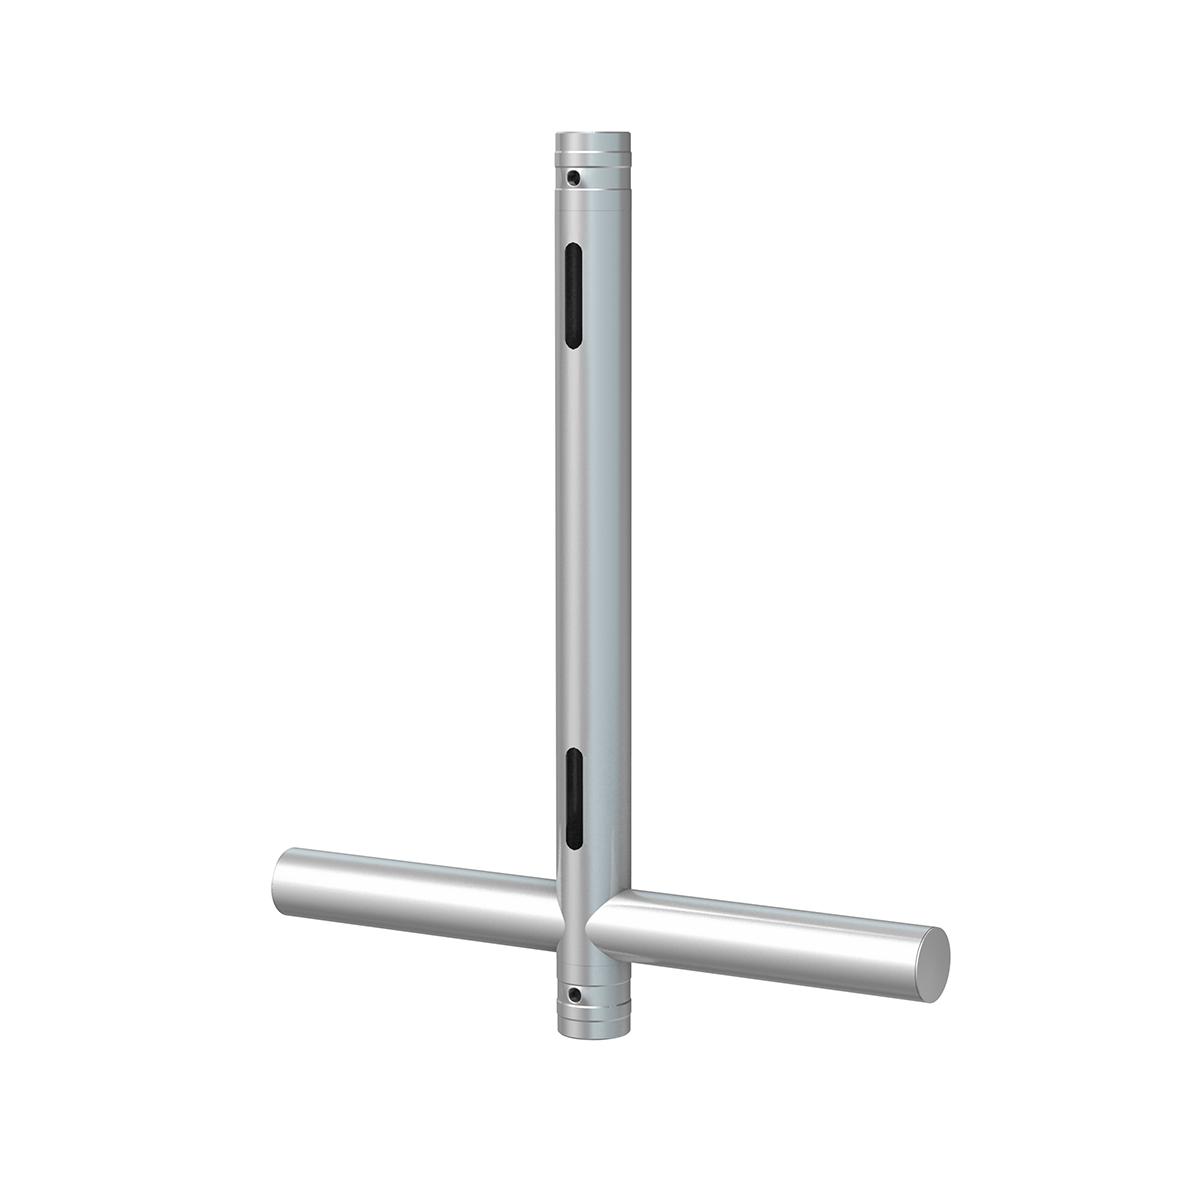 T_modular_drop_arm_silver